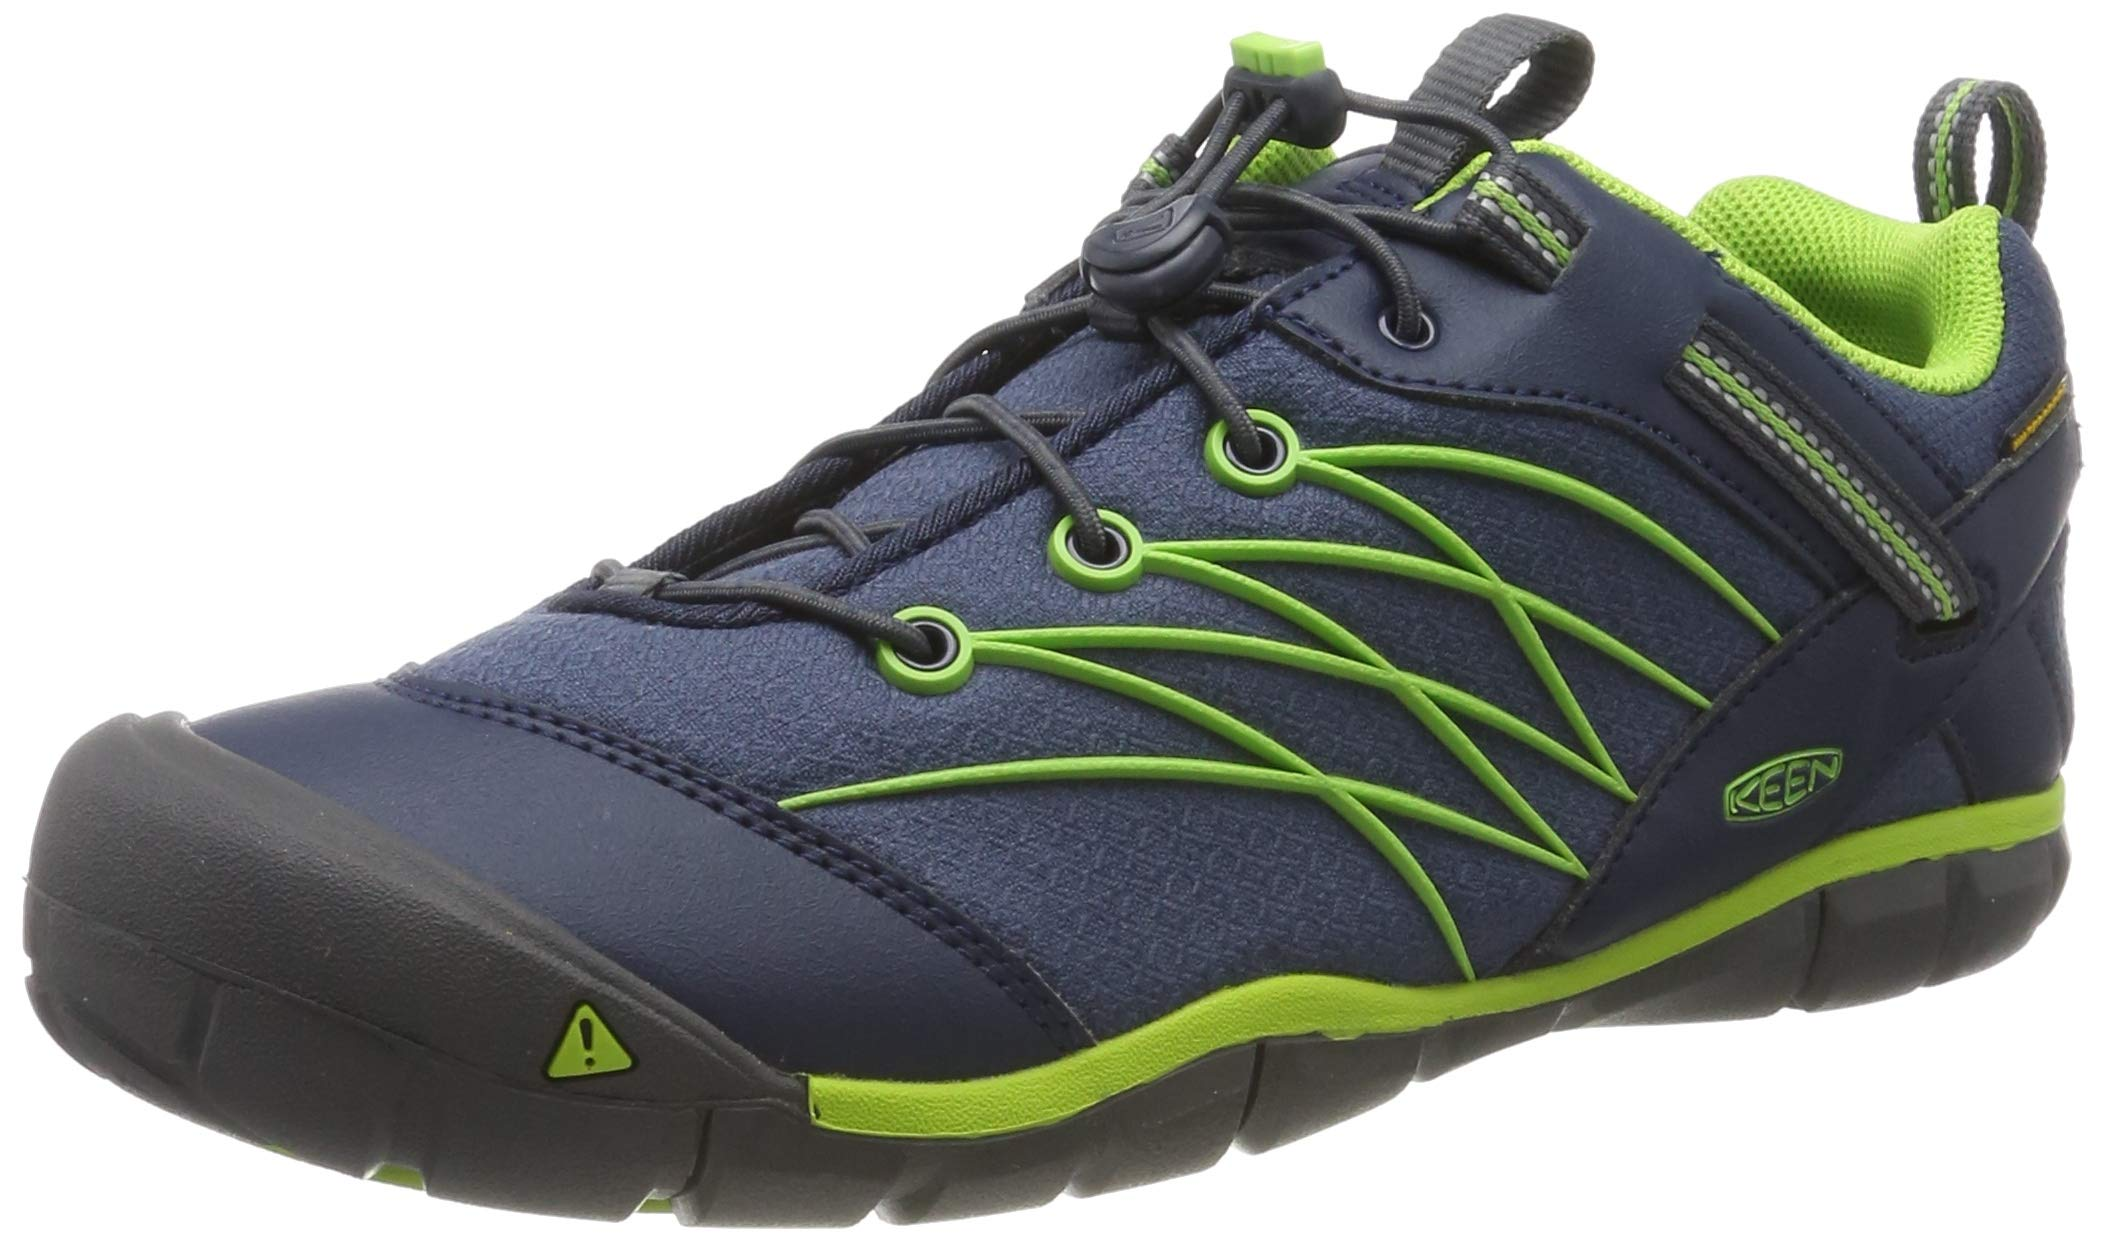 Keen Chandler CNX WP Hiking Shoe, Dress Blues/Greenery, 7 M US Big Kid